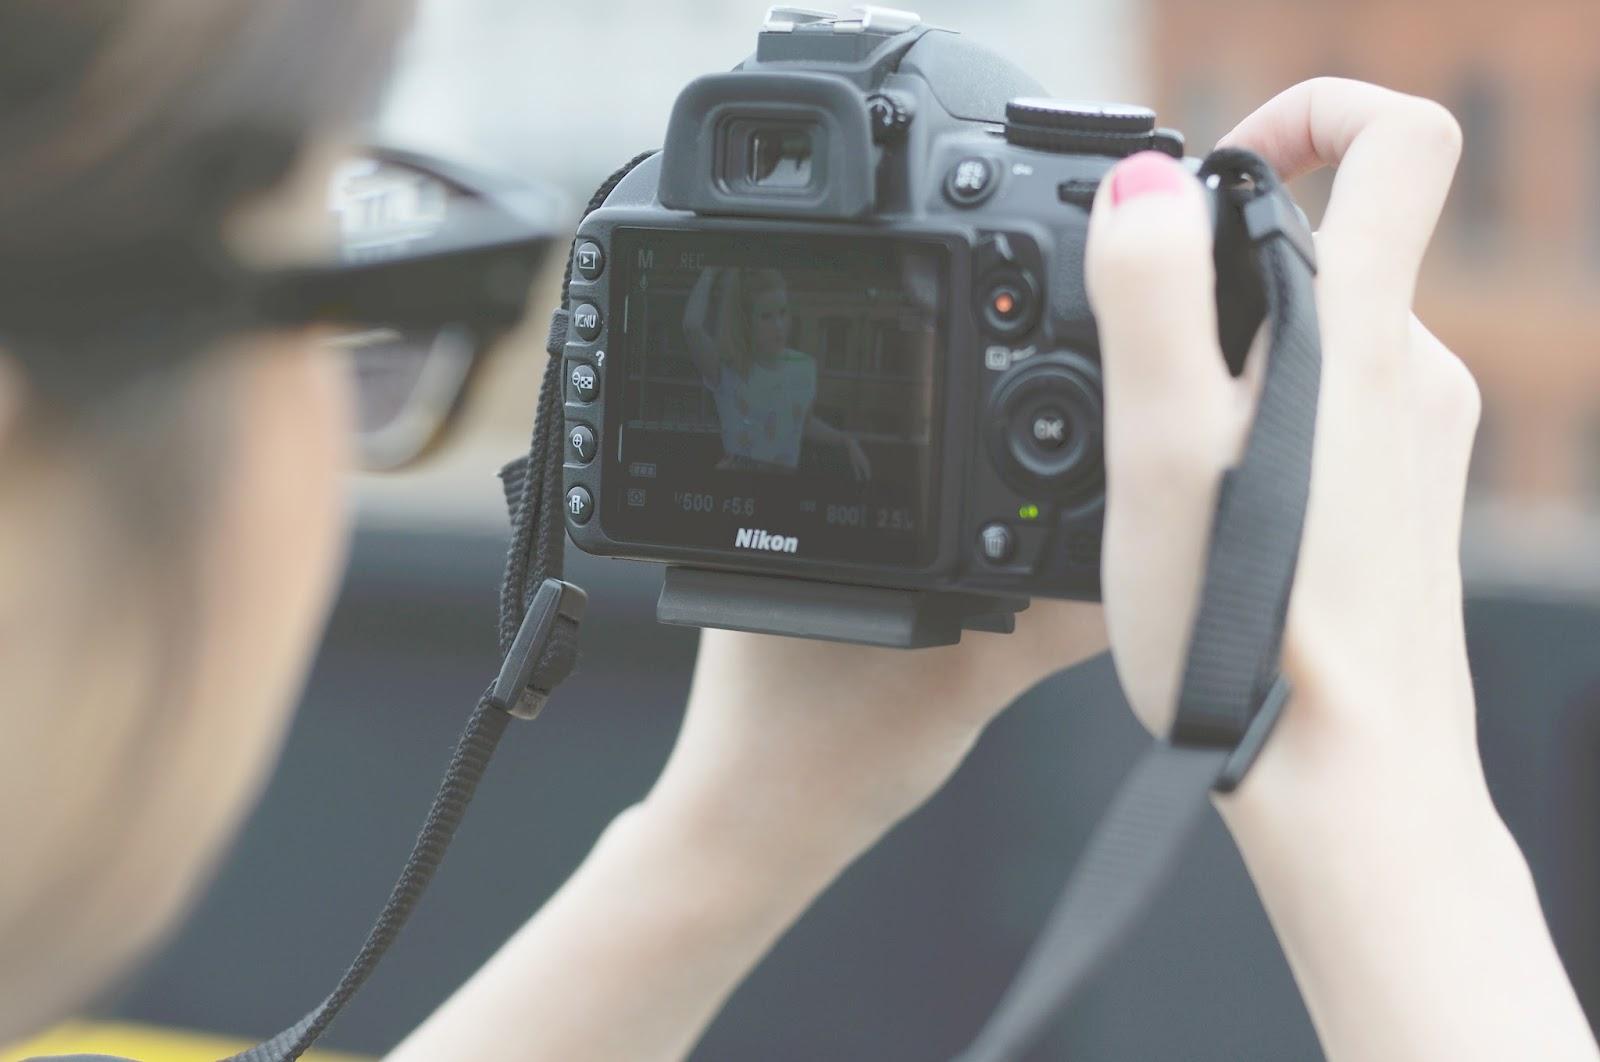 nikon d3100, nikon d3100 filming videos